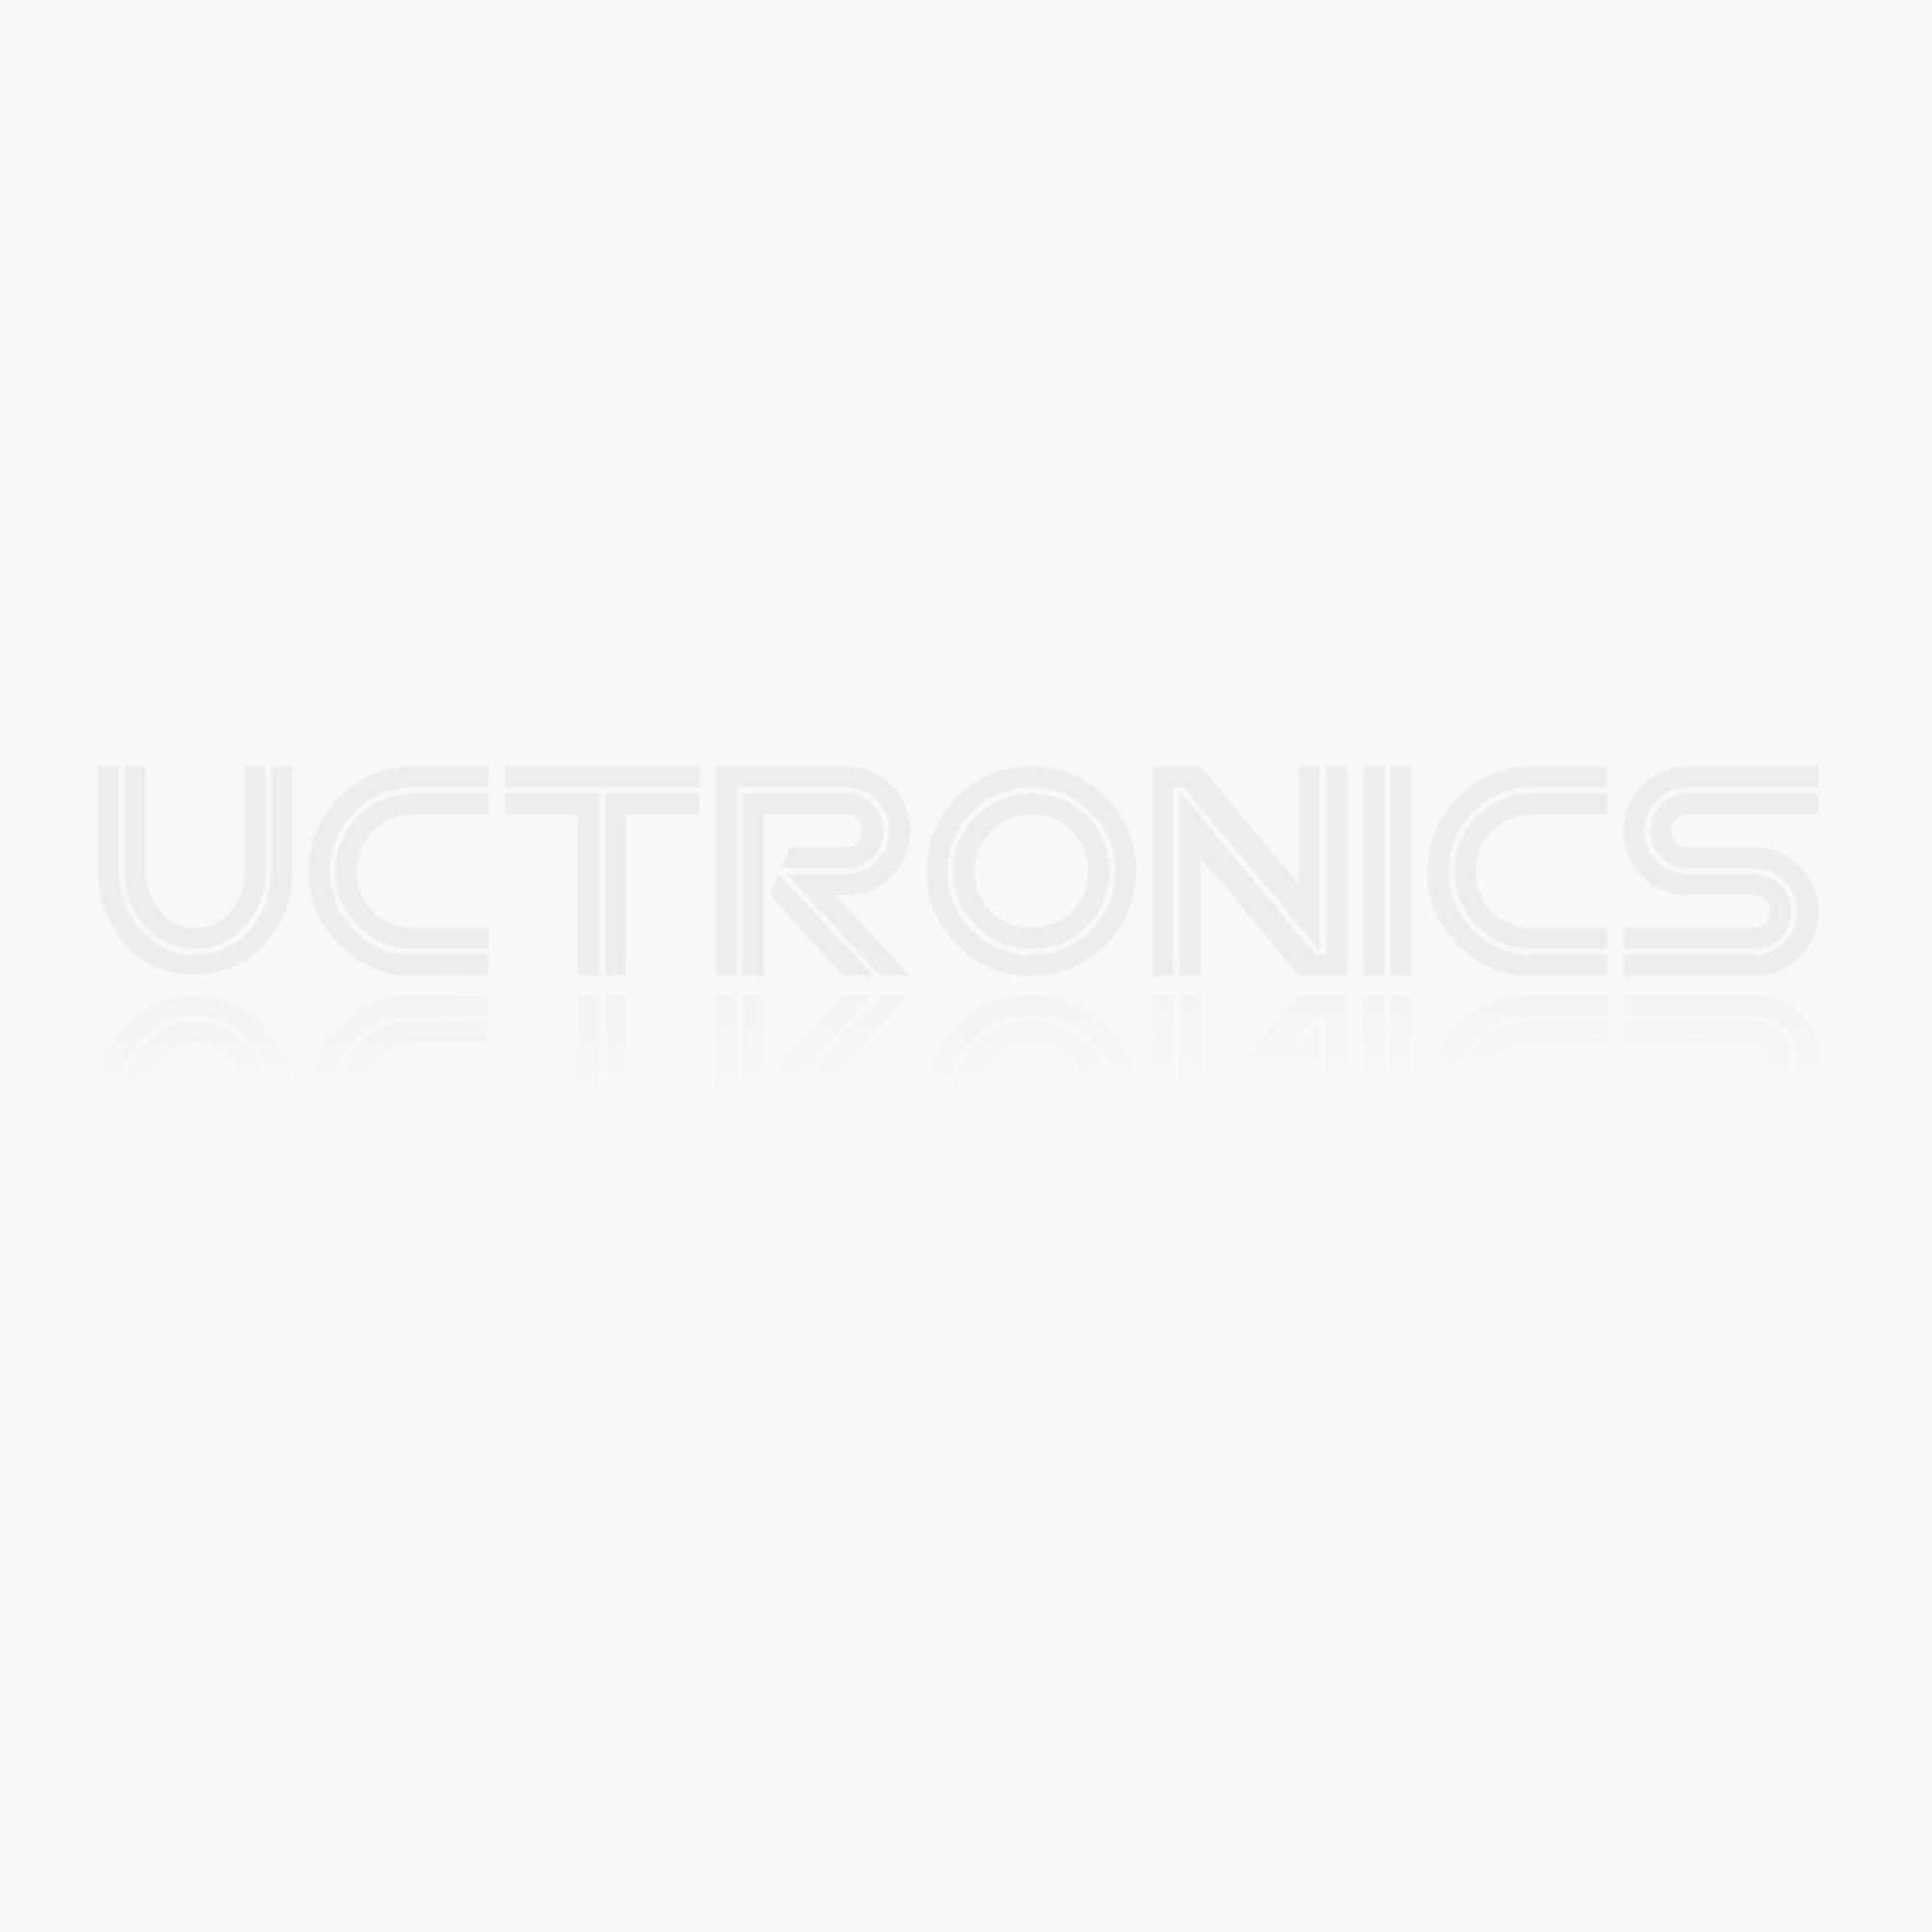 Arducam 8MP Synchronized Stereo Camera Bundle Kit for Jetson Nano